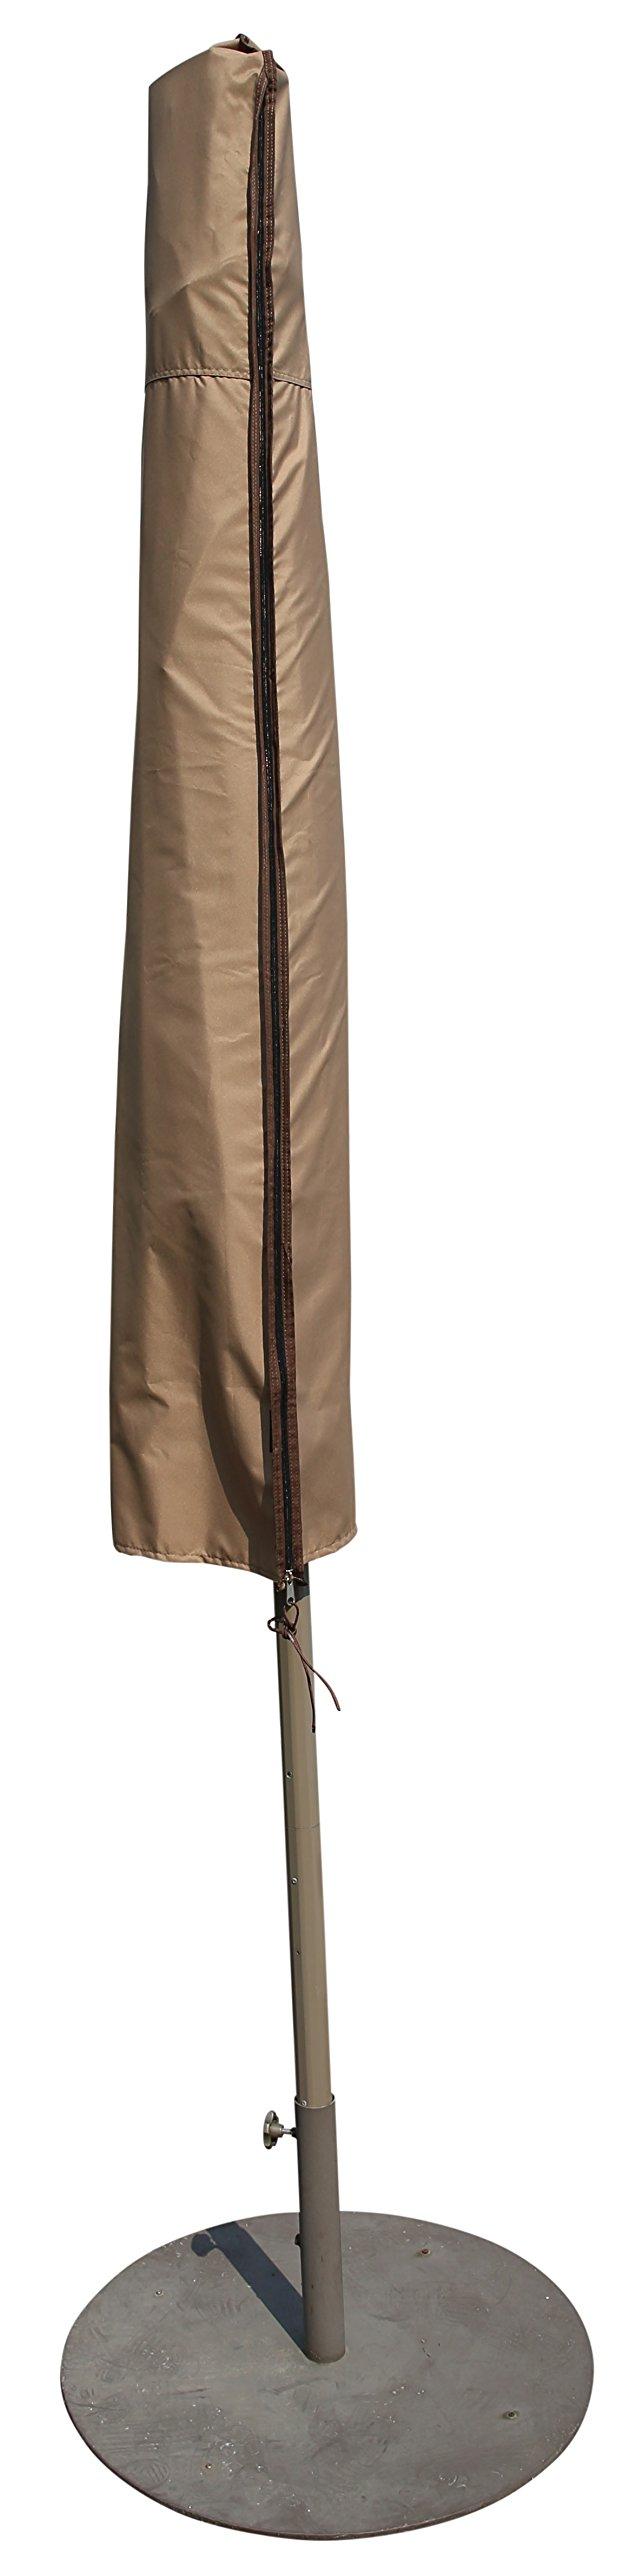 SORARA Patio Umbrella Cover for 9'-11' Umbrella, Water Resistant, Brown by SORARA